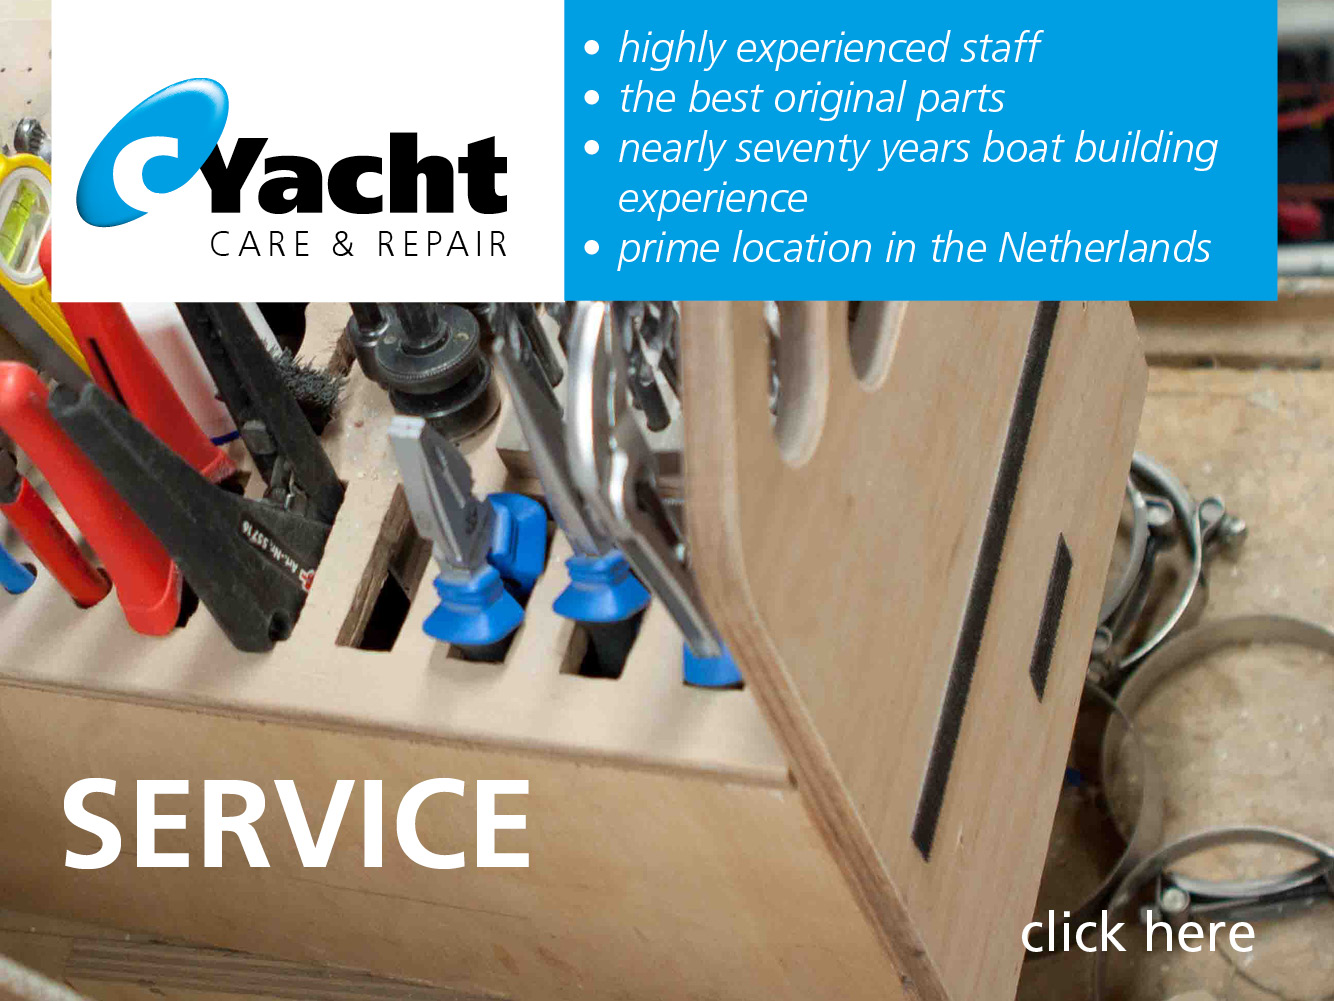 service-c-yacht-care-repair-e